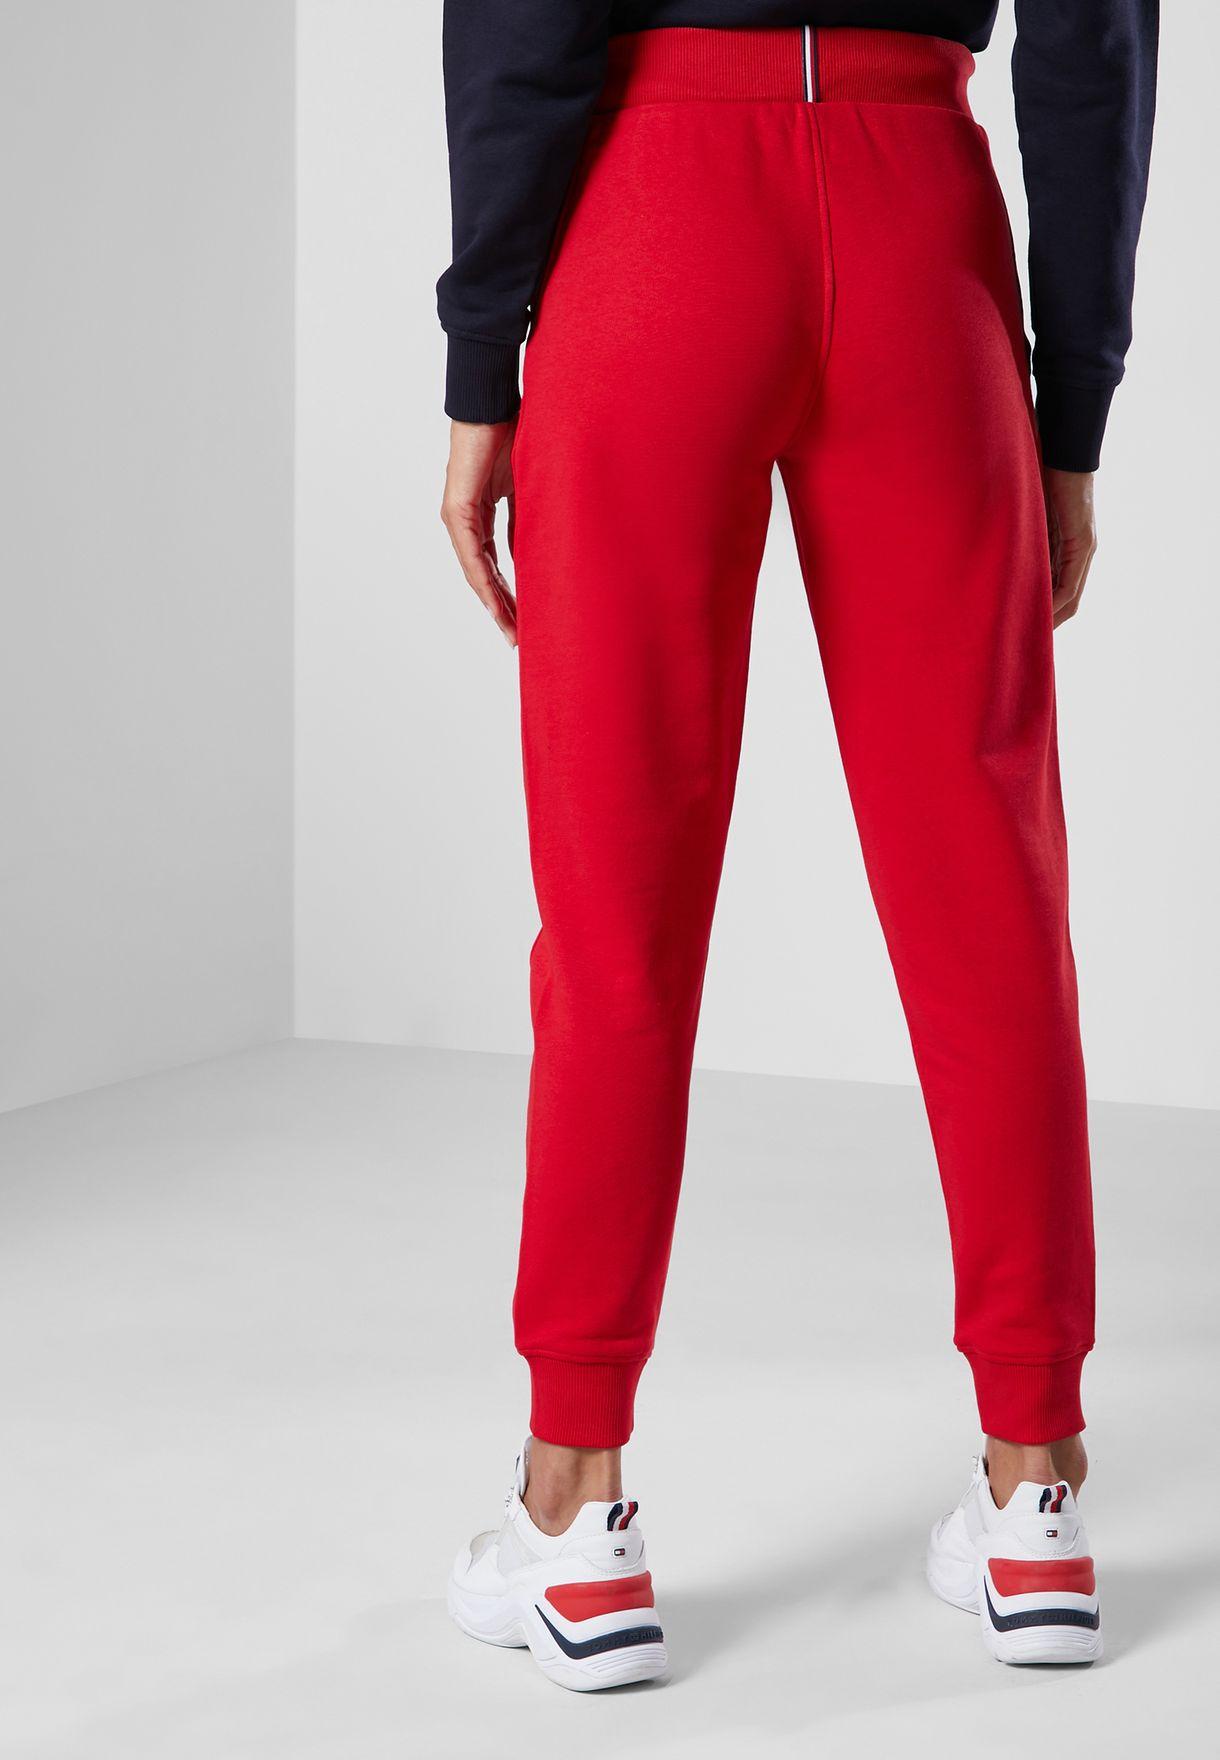 Regular Ghaphic Sweatpants